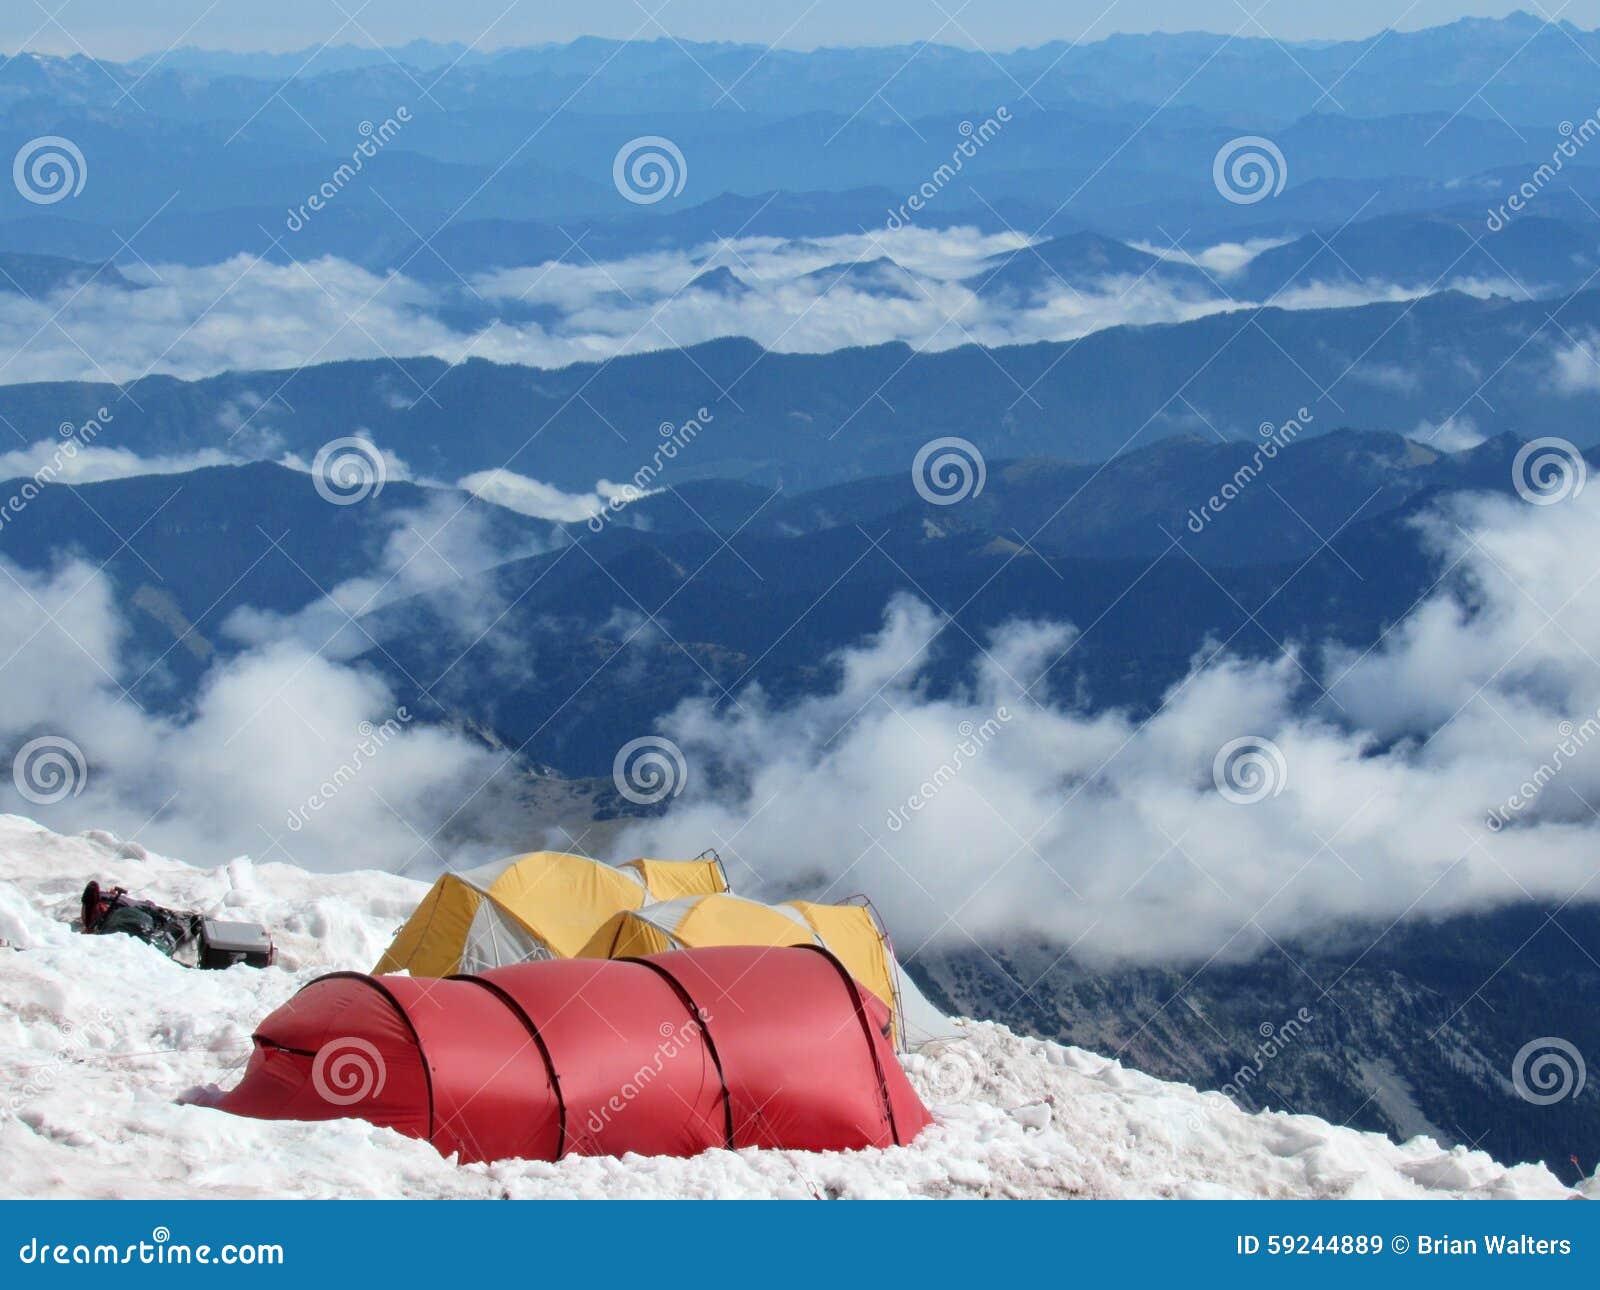 Tiendas de montaña